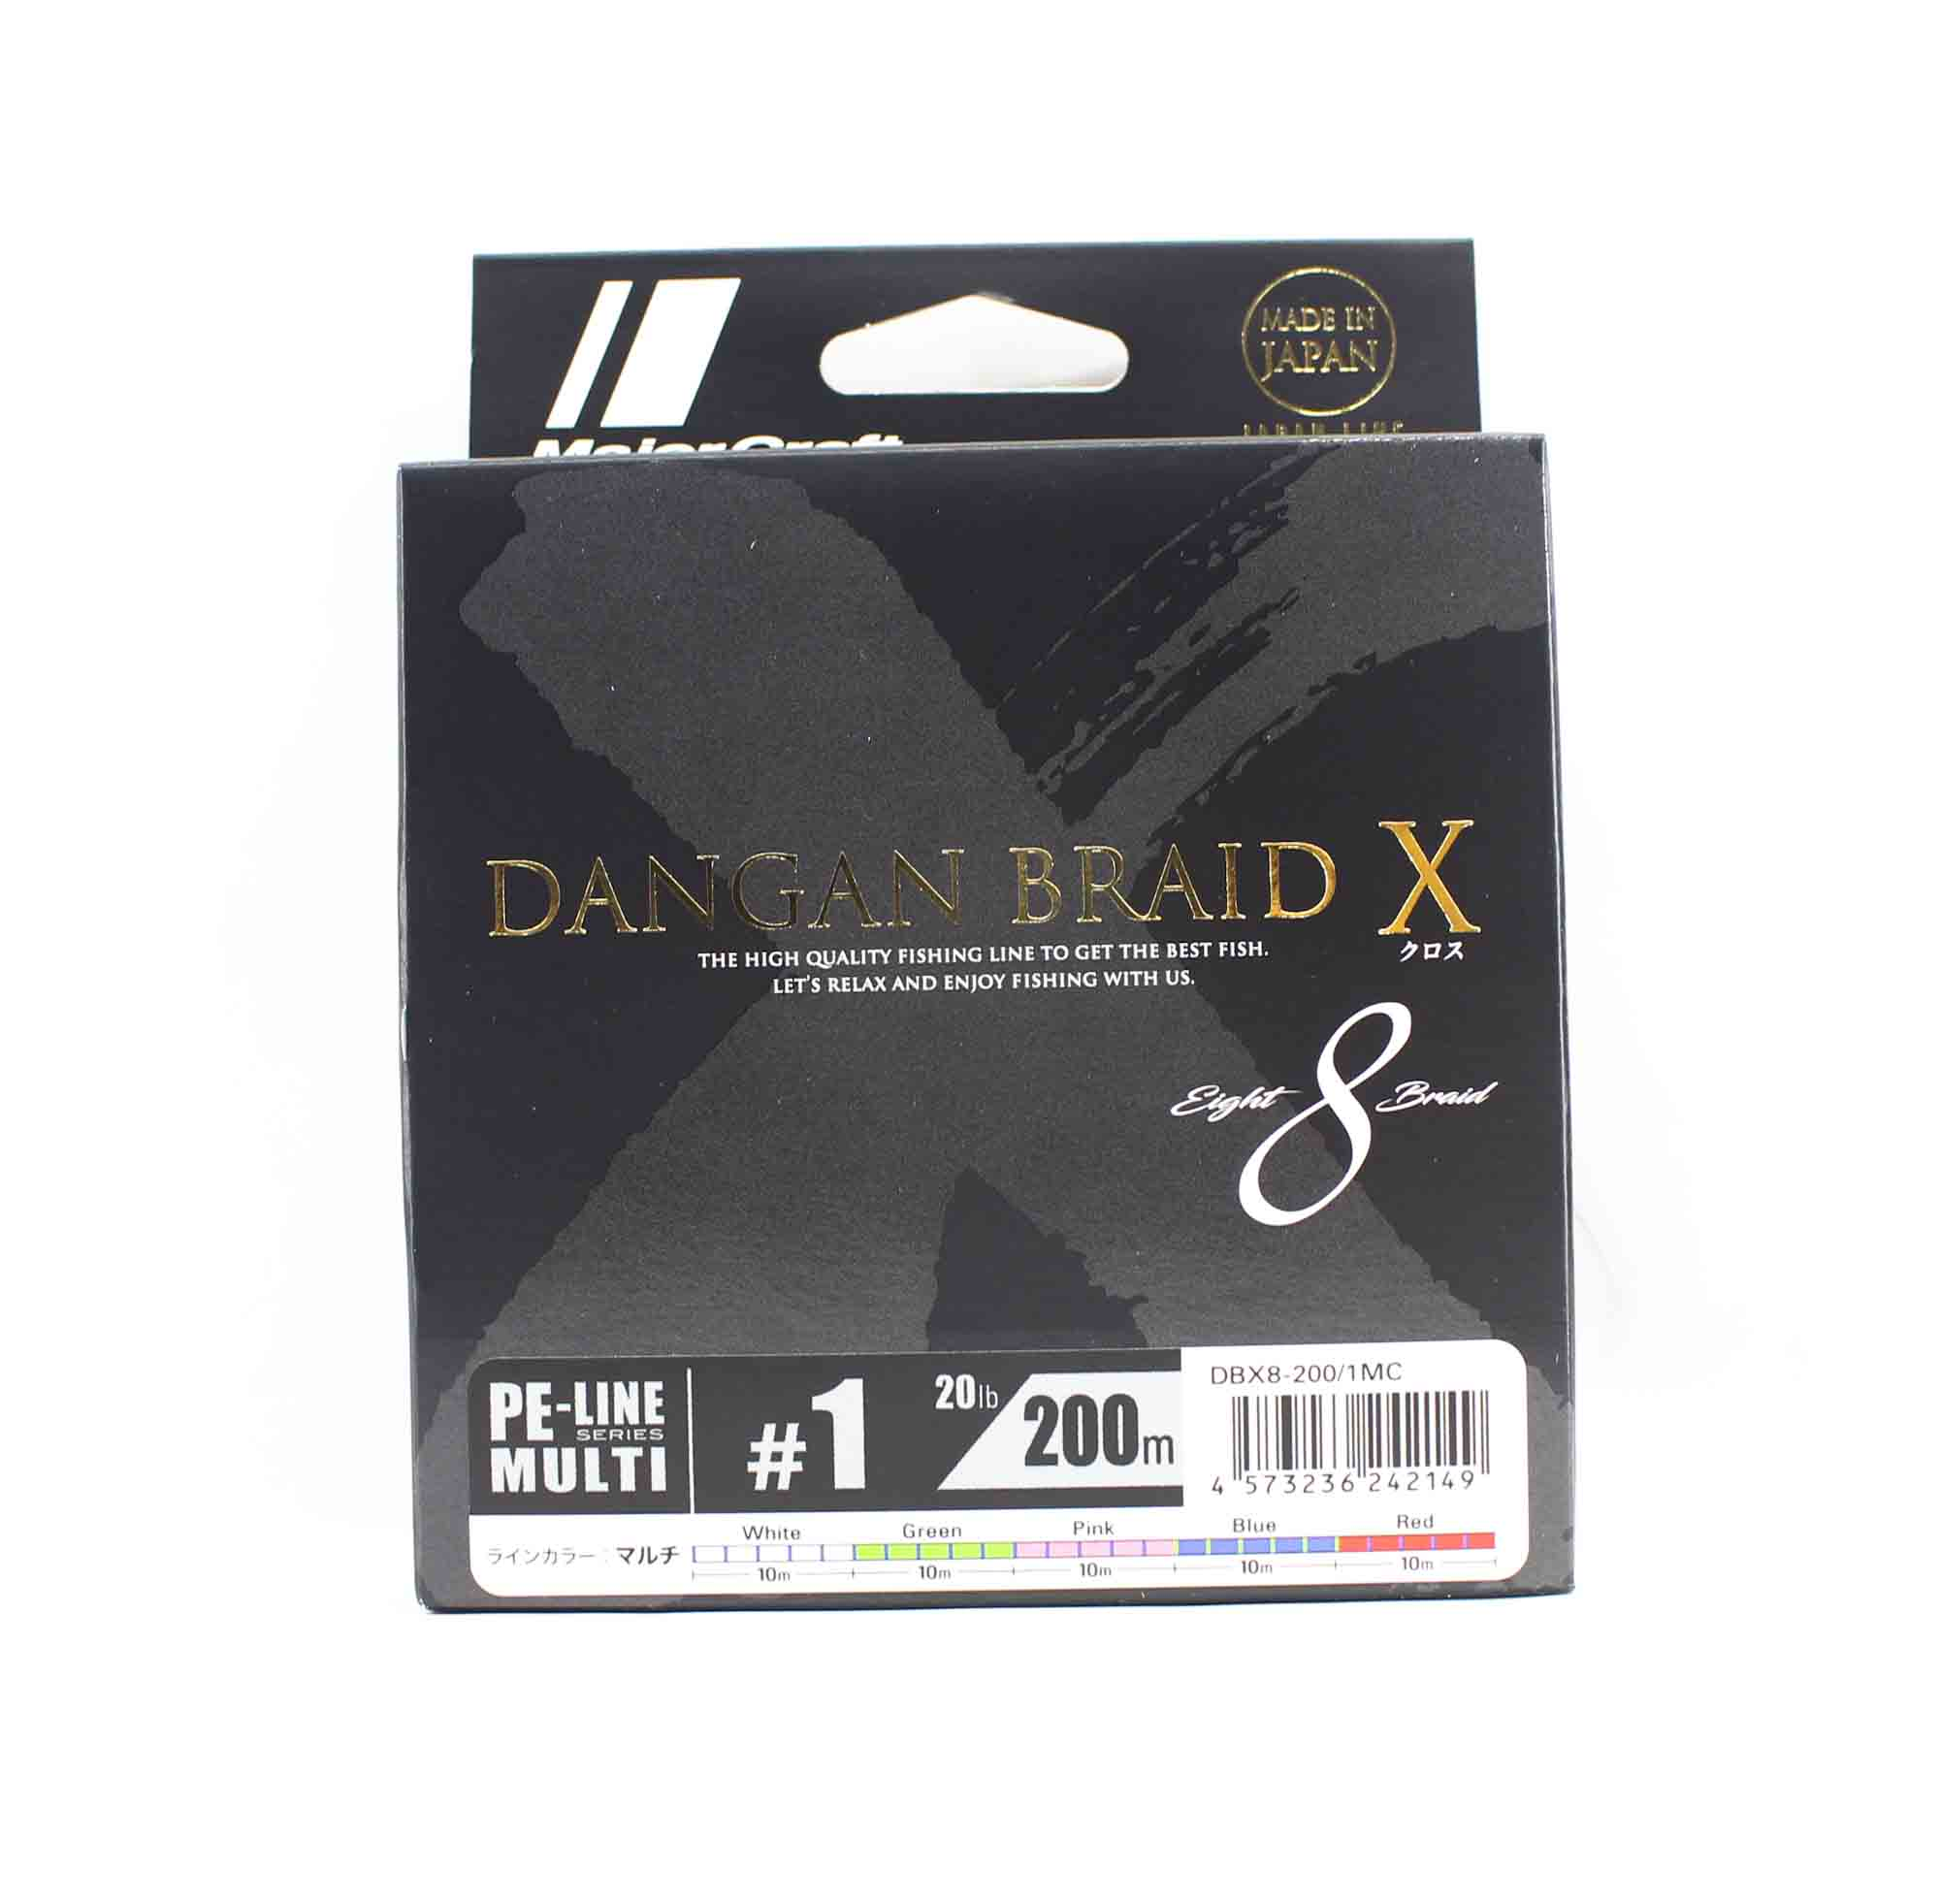 Major Craft Dangan Braid X Line X8 200m P.E 1 Multi DBX8-200/1MC (2149)